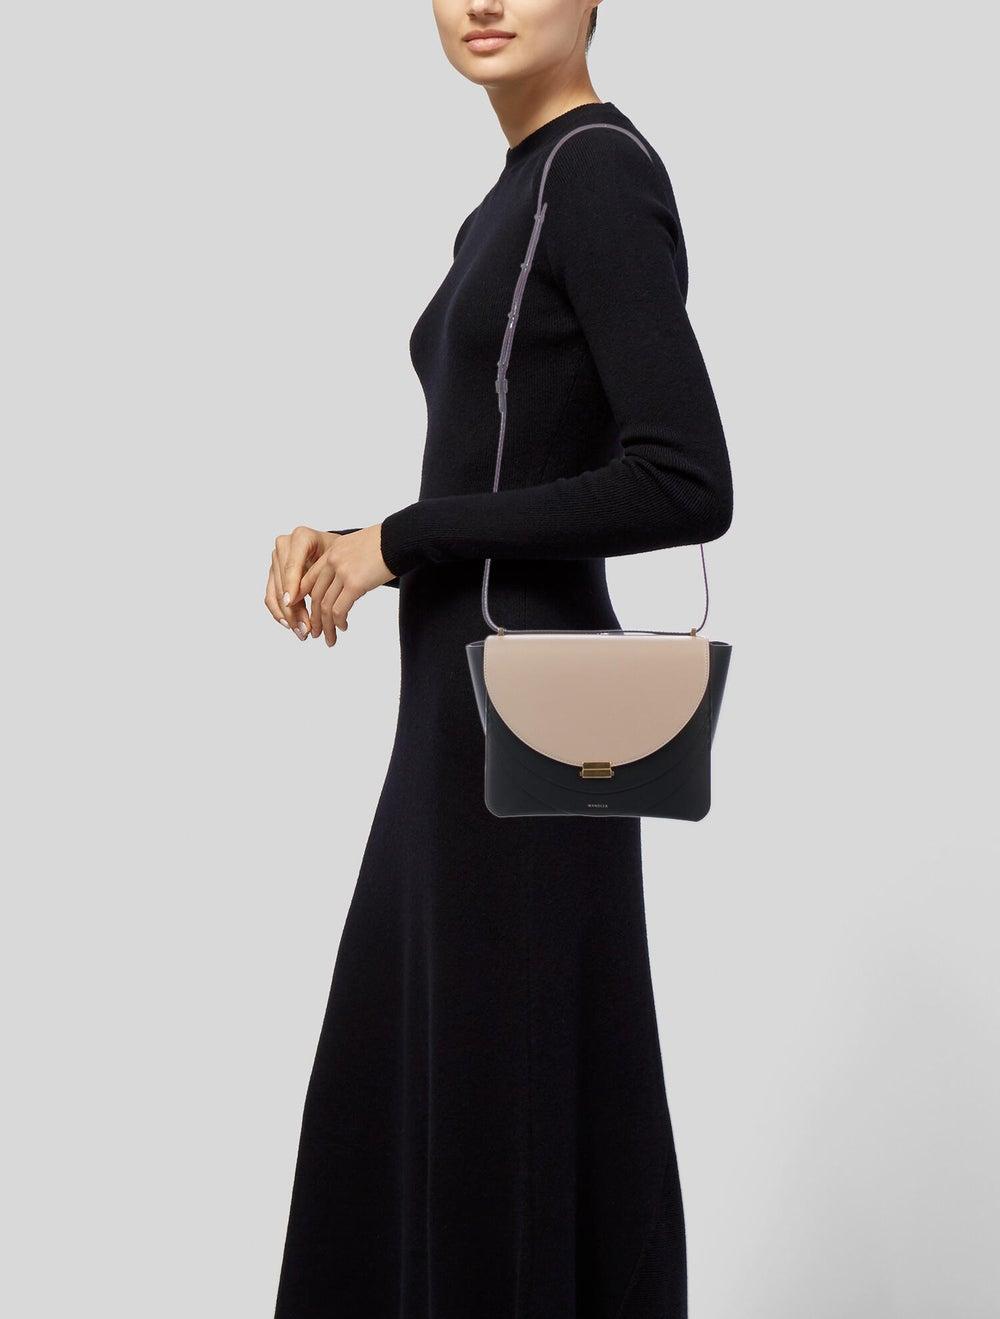 Wandler Leather Colorblock Crossbody Bag Black - image 2